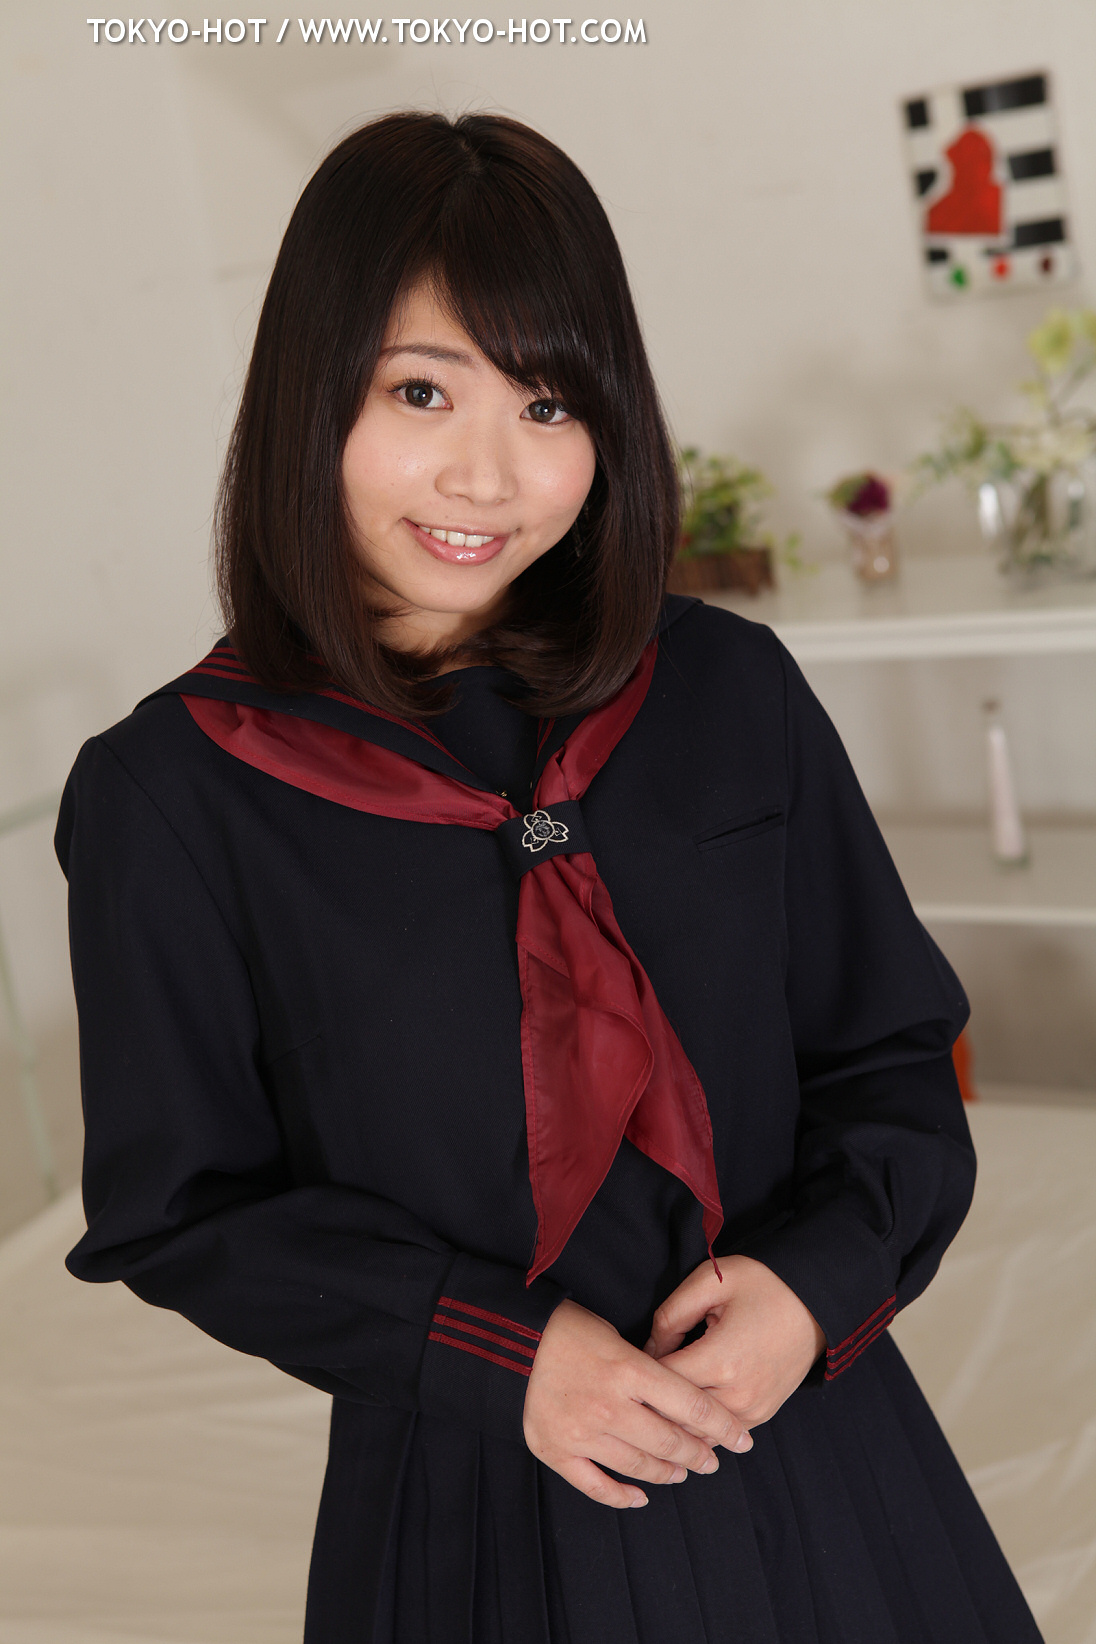 e1140makoto_hirose_0006.